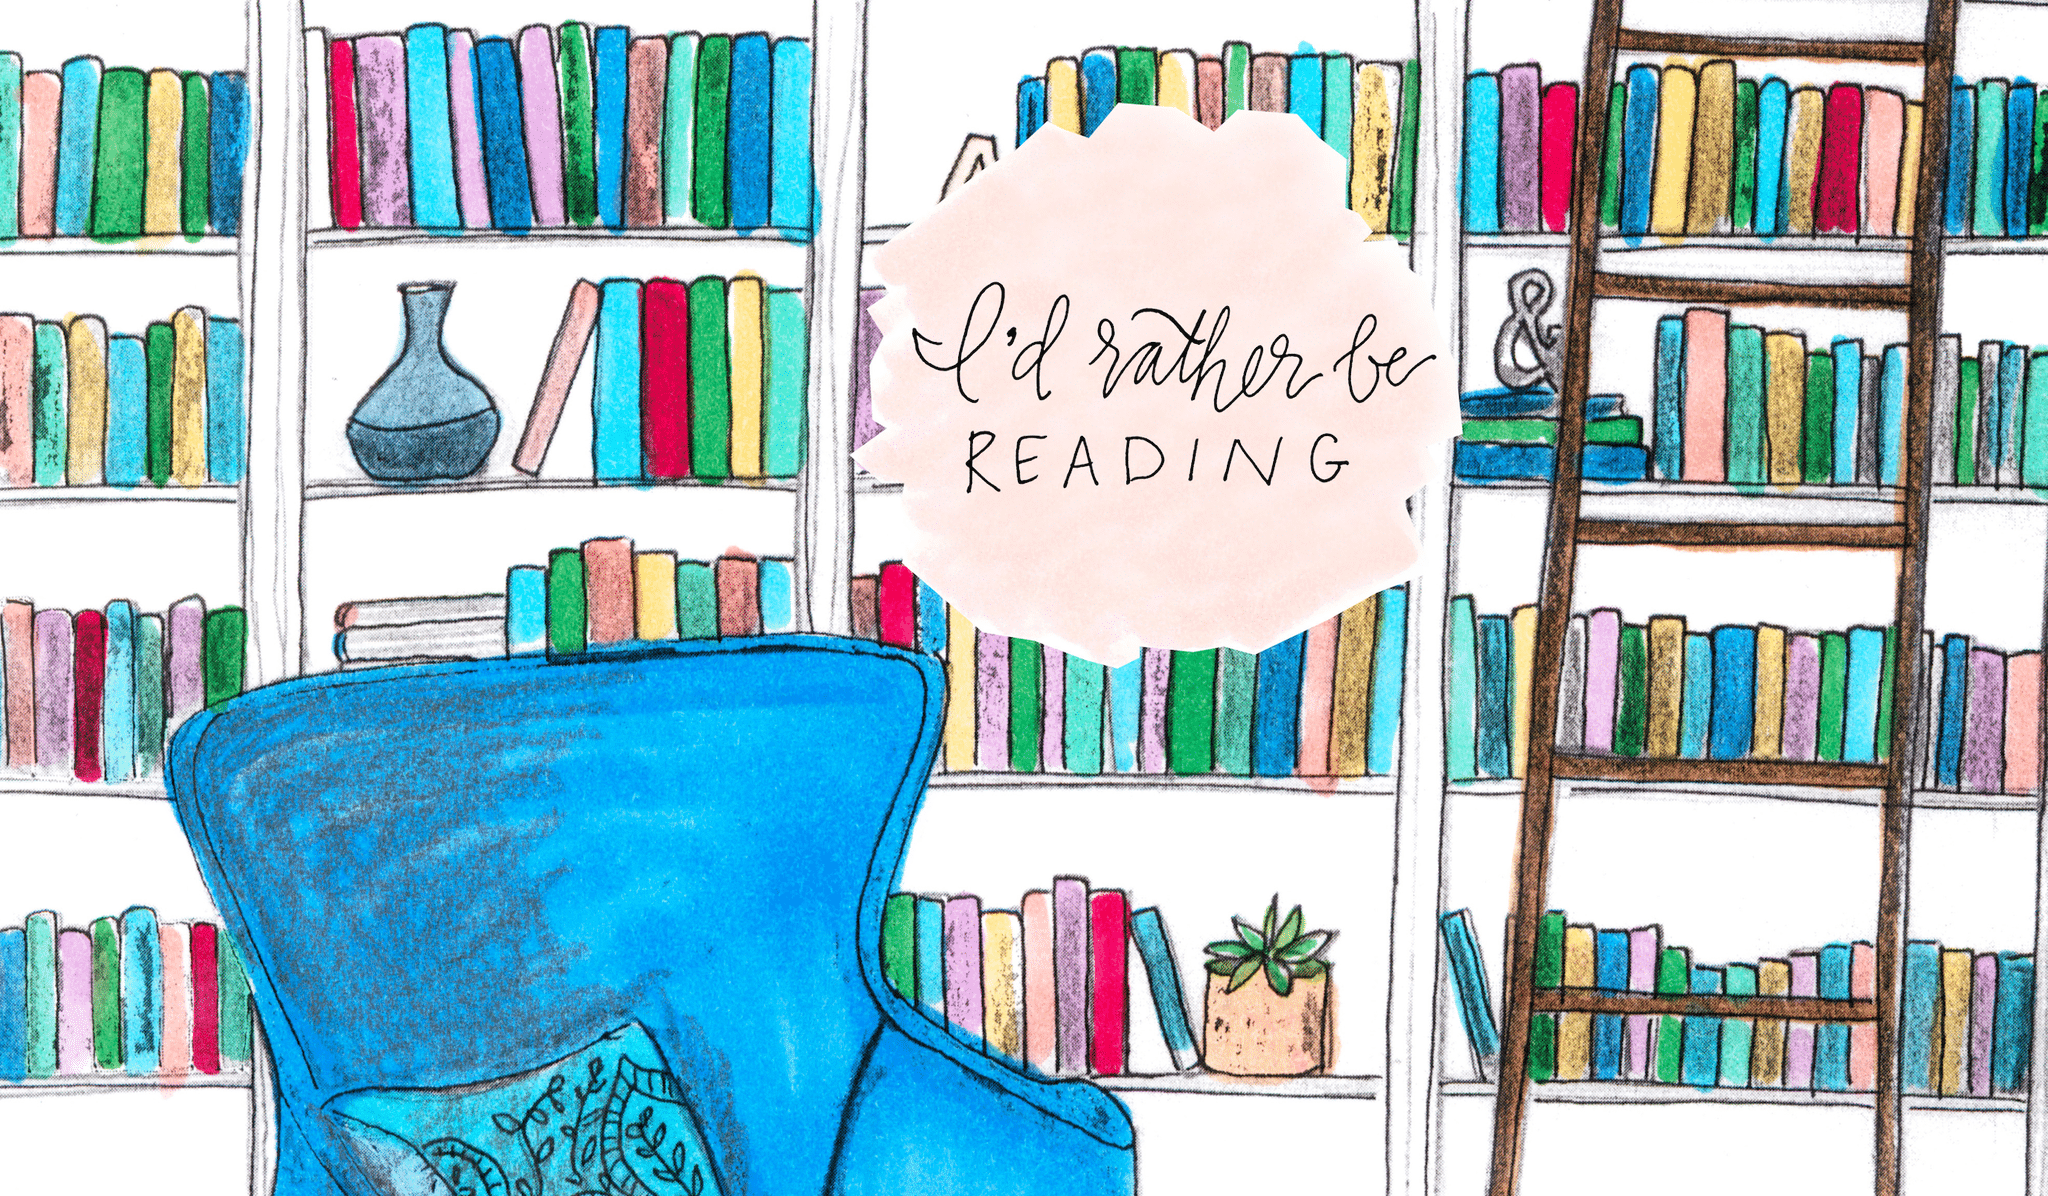 The 2018 Reading Challenge – Modern Mrs. Darcy